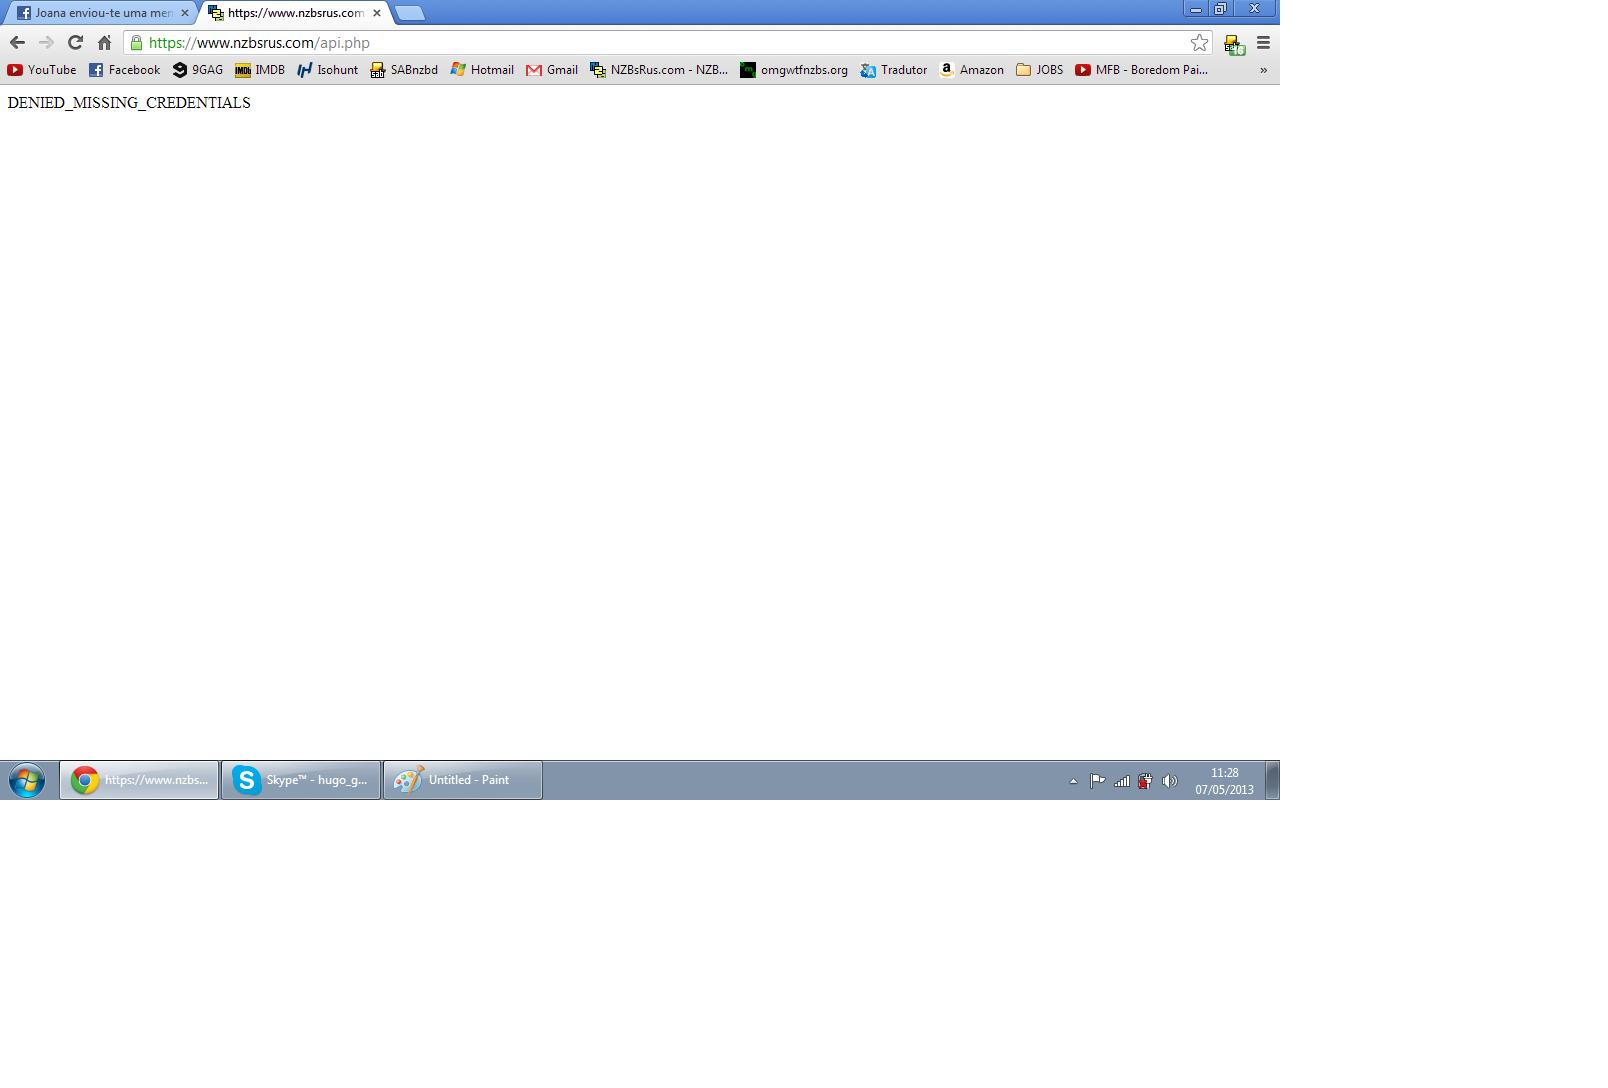 nzbsrus com send to sabnzbd button broken issue 77 gboudreau